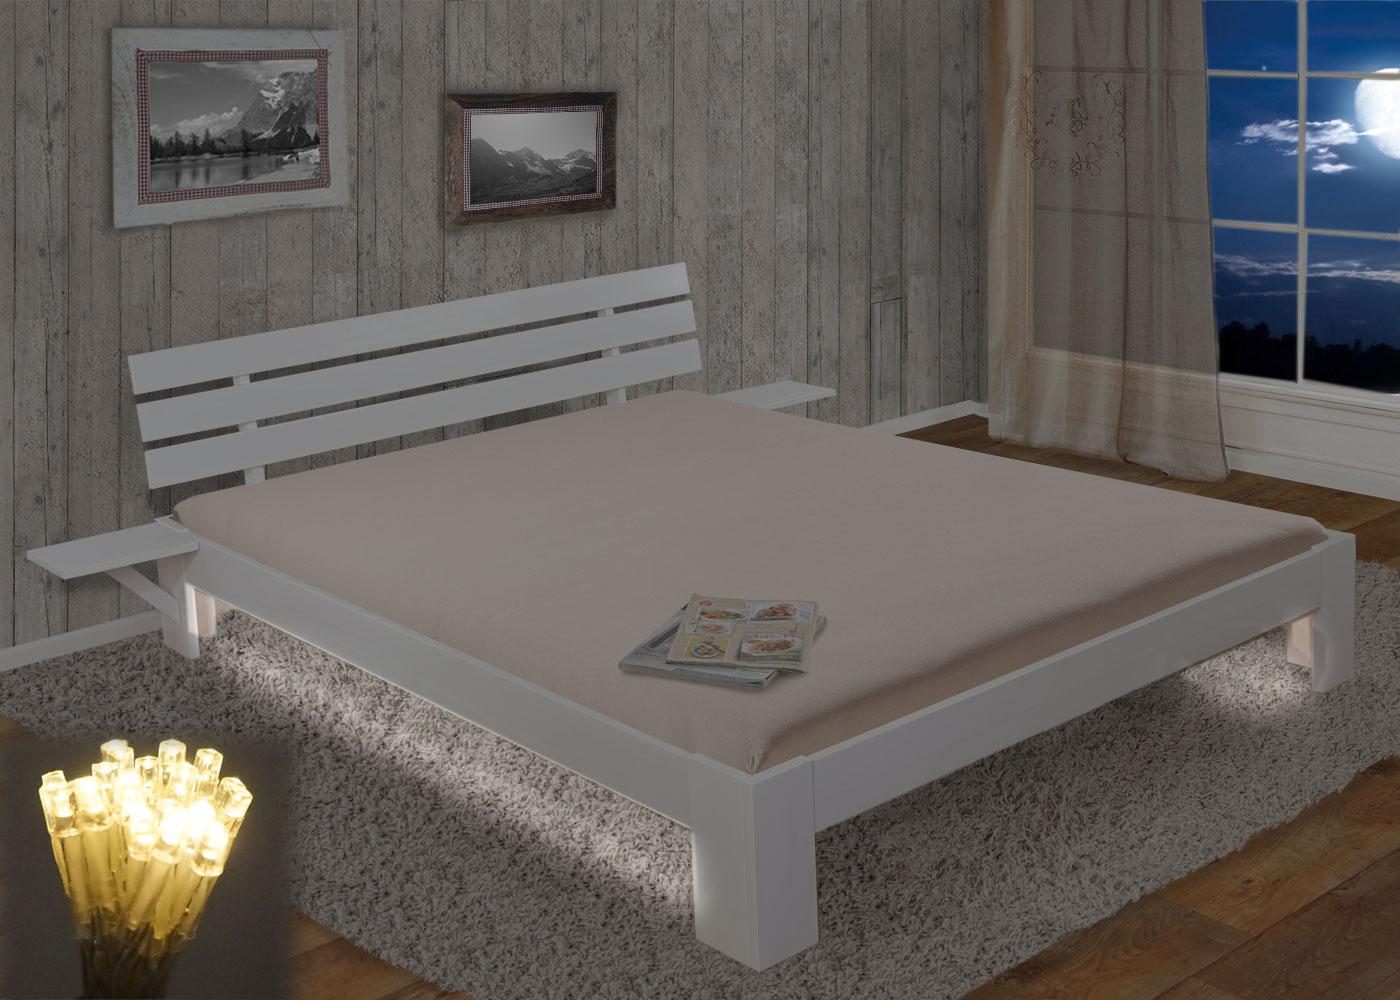 bett perth doppelbett massivholz inkl lattenrost ablage kiefer 160x200cm wei lackiert led. Black Bedroom Furniture Sets. Home Design Ideas